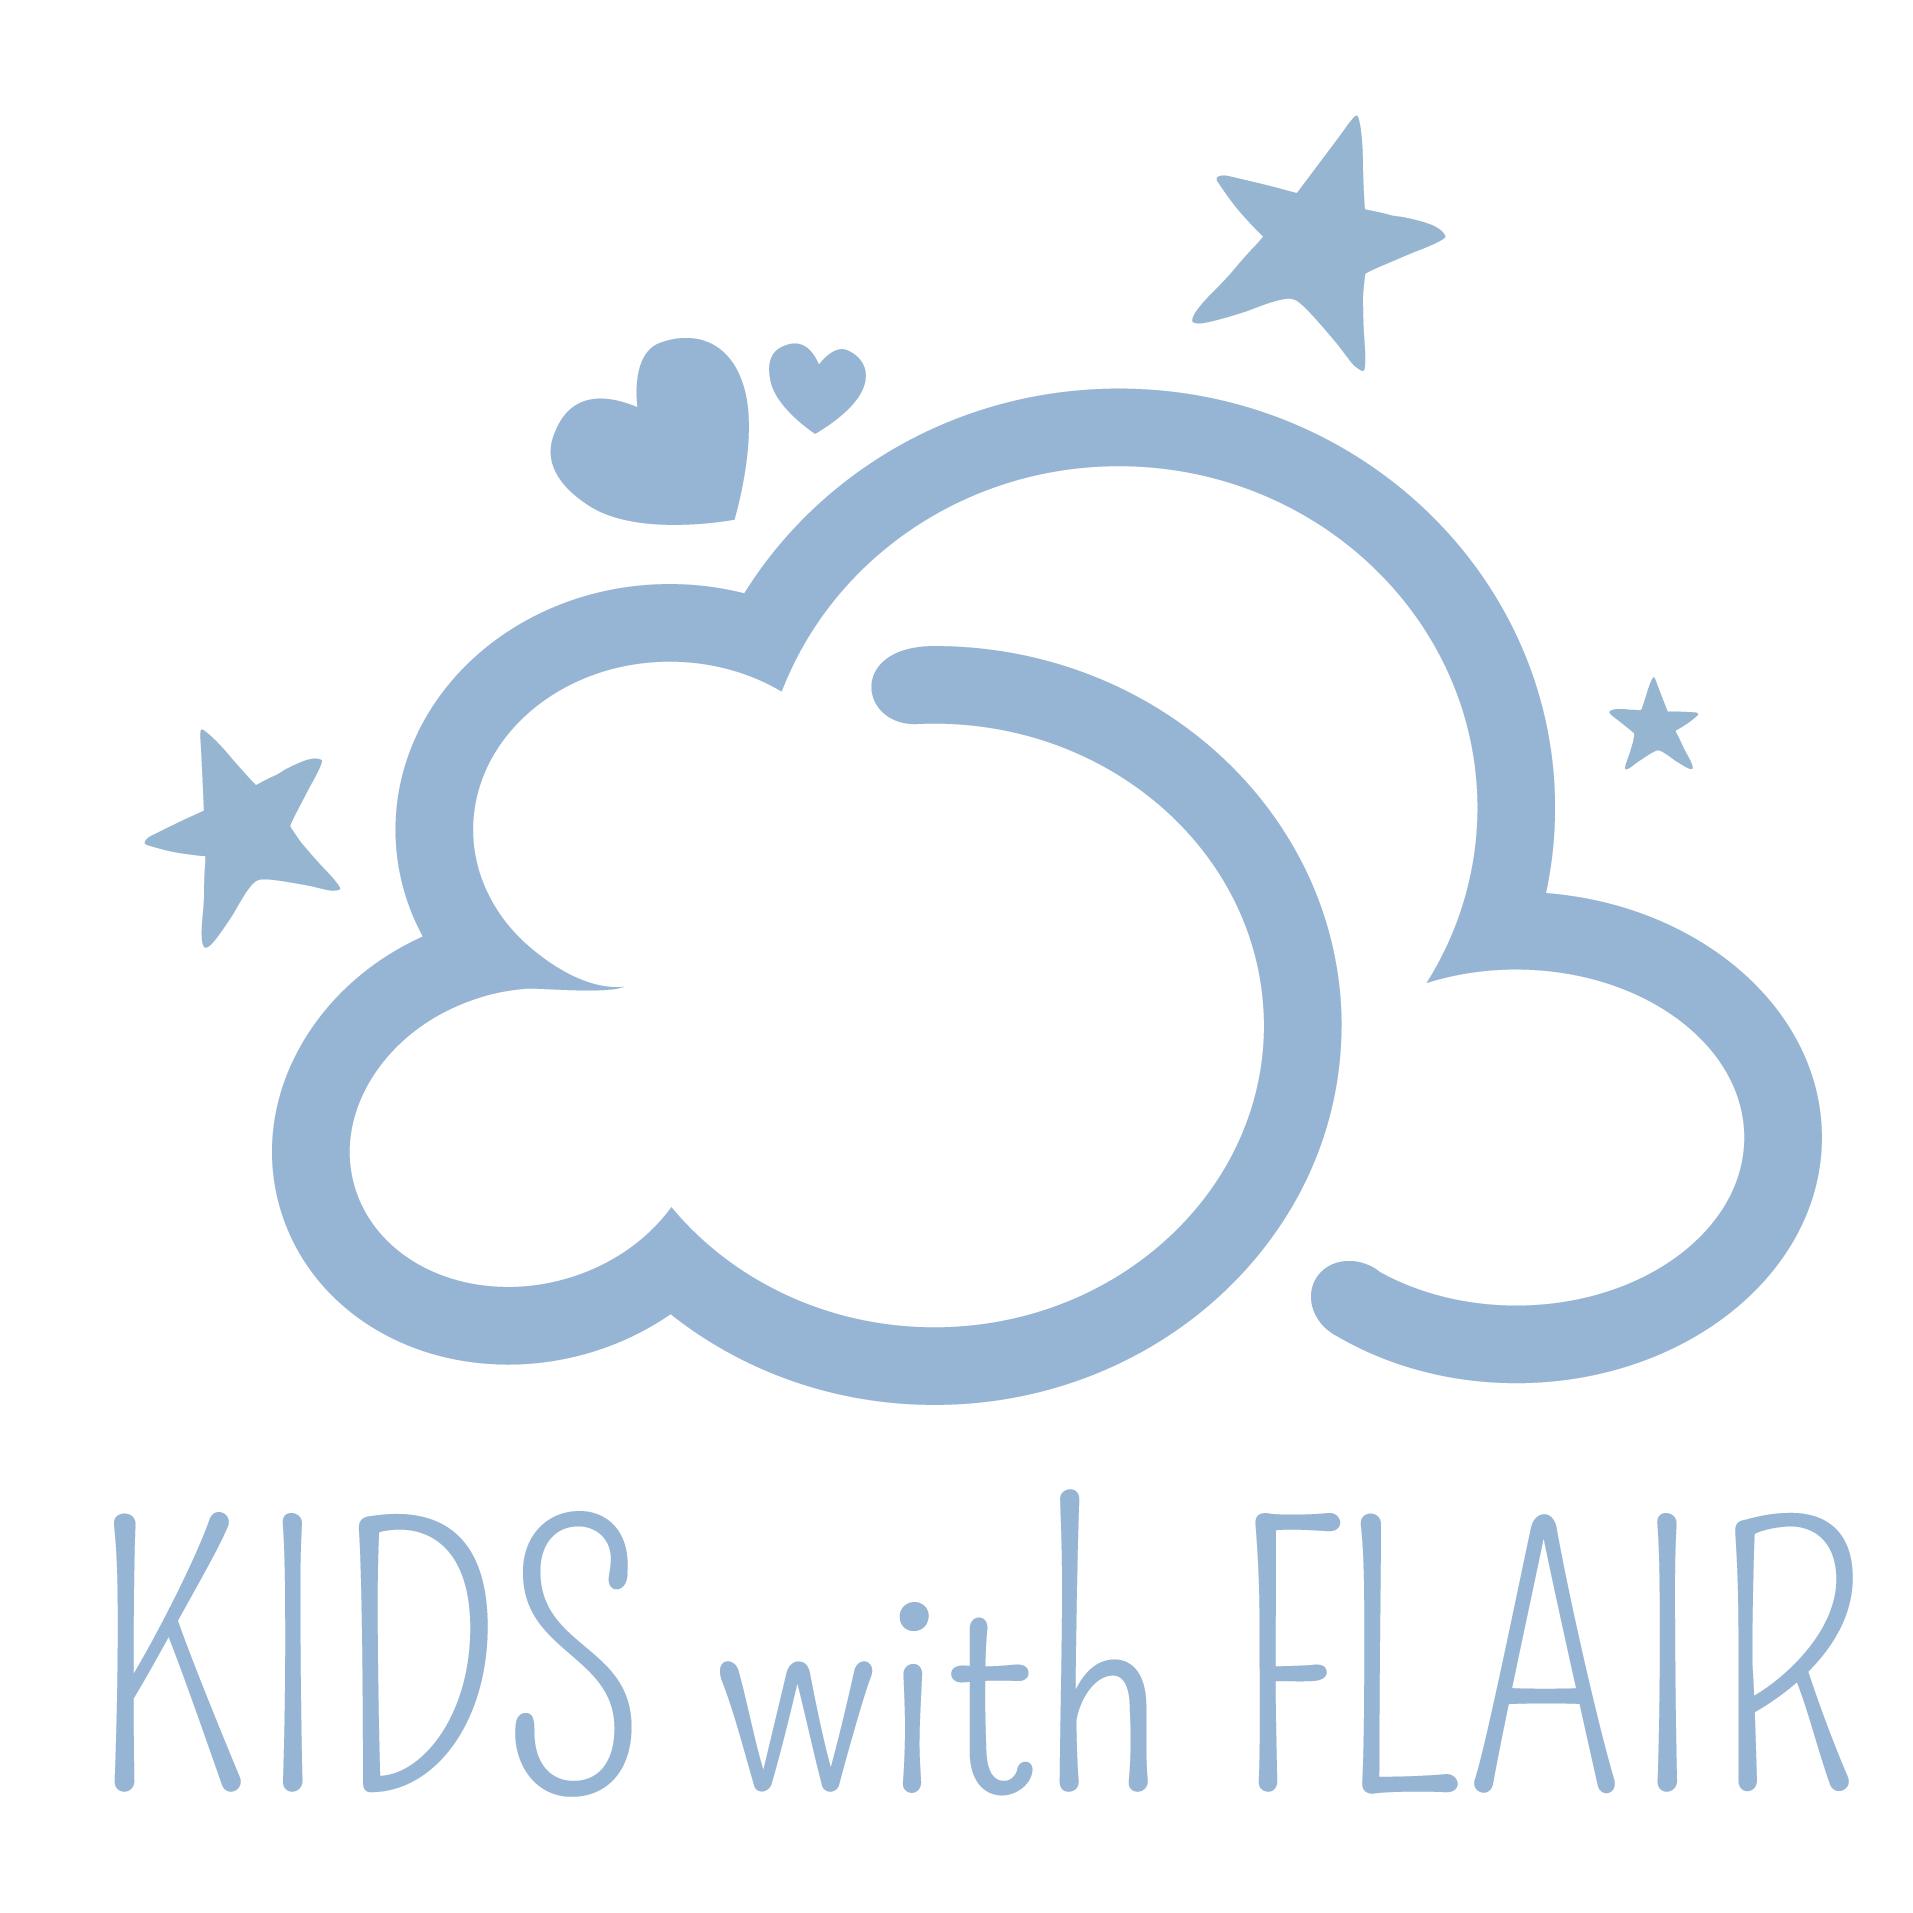 kidswithflair